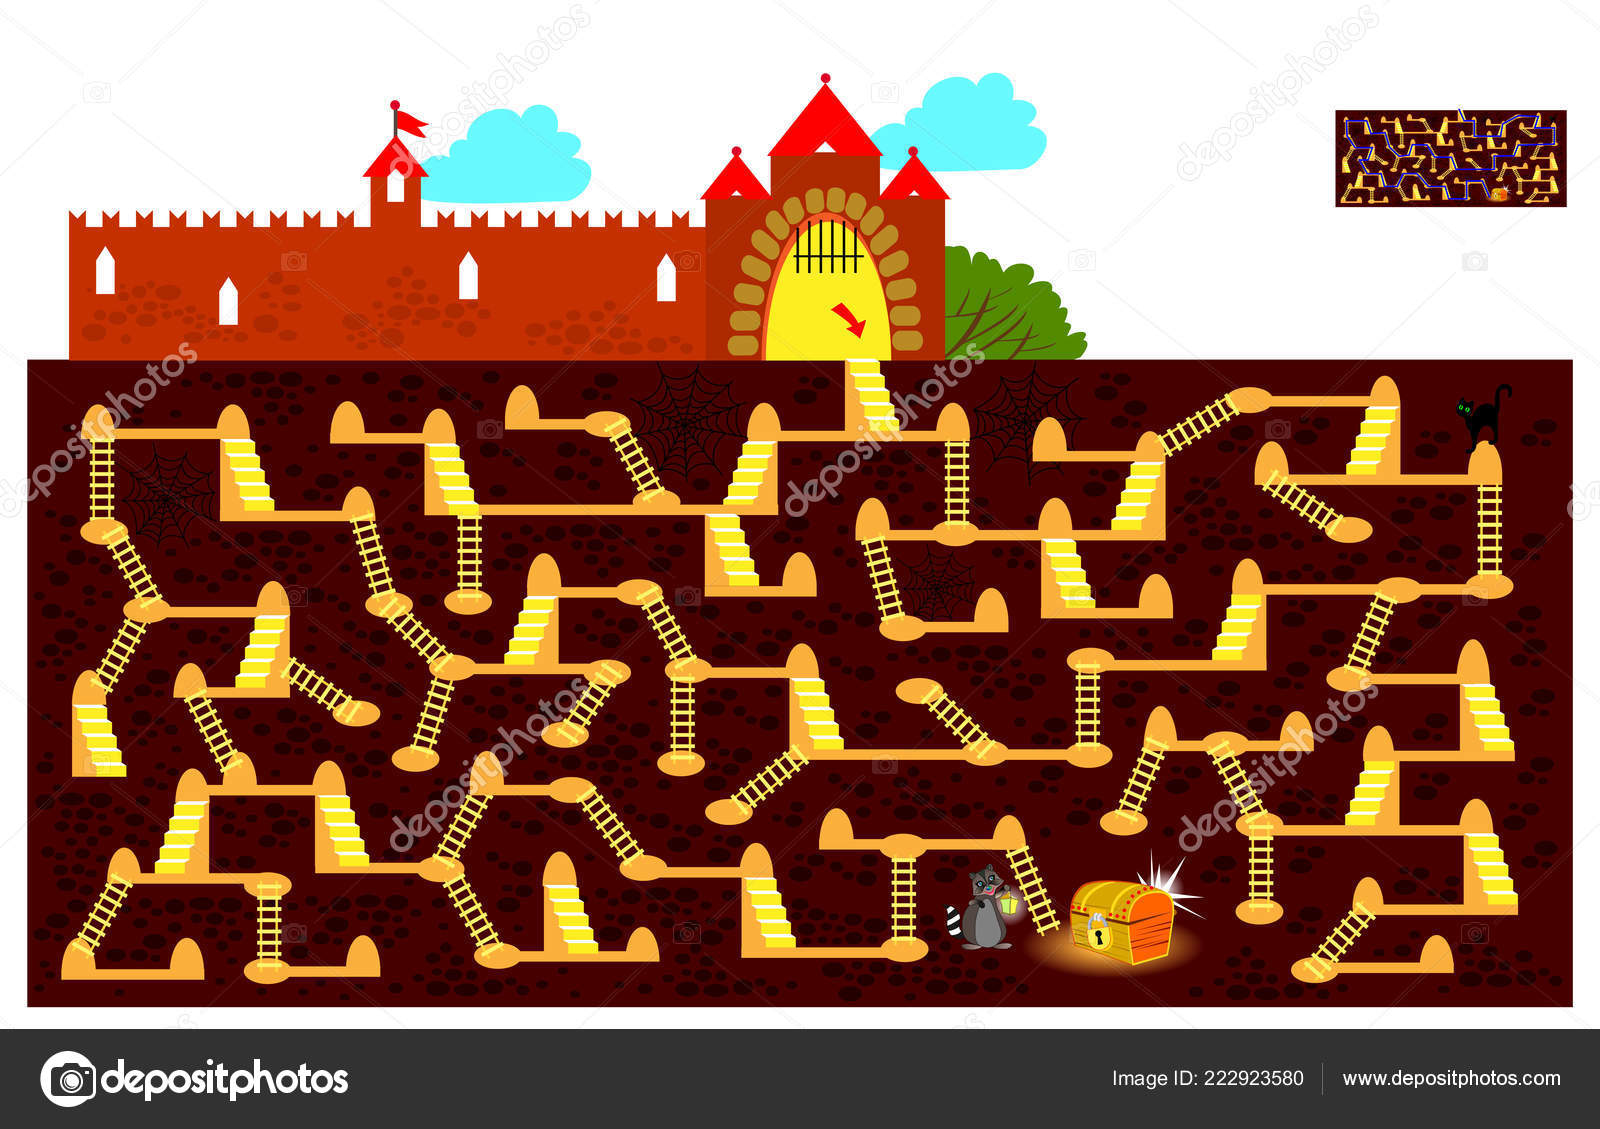 Logic Puzzle Game Labyrinth Children Adults Find Way Underground